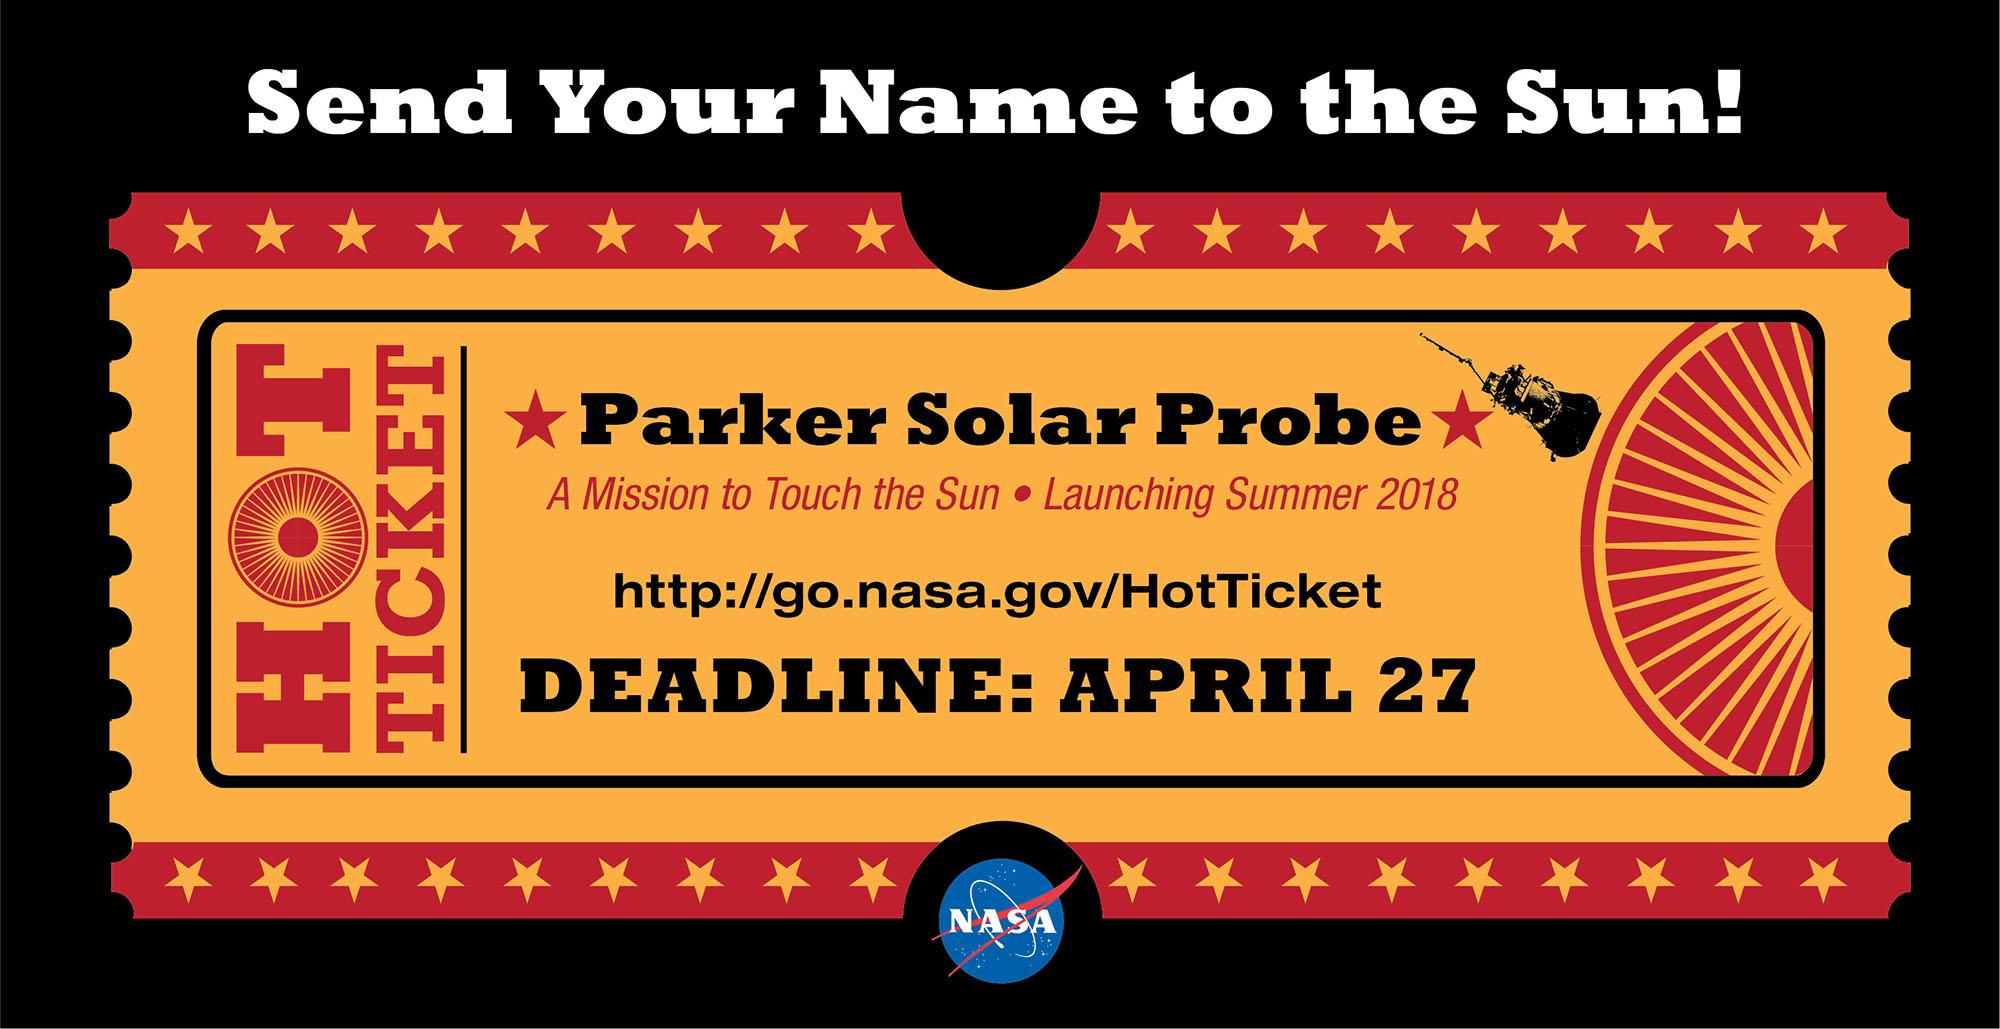 nasa готовится к запуску космического зонда на Солнце NASA готовится к запуску космического зонда на Солнце send your name to the sun shareable1 v22